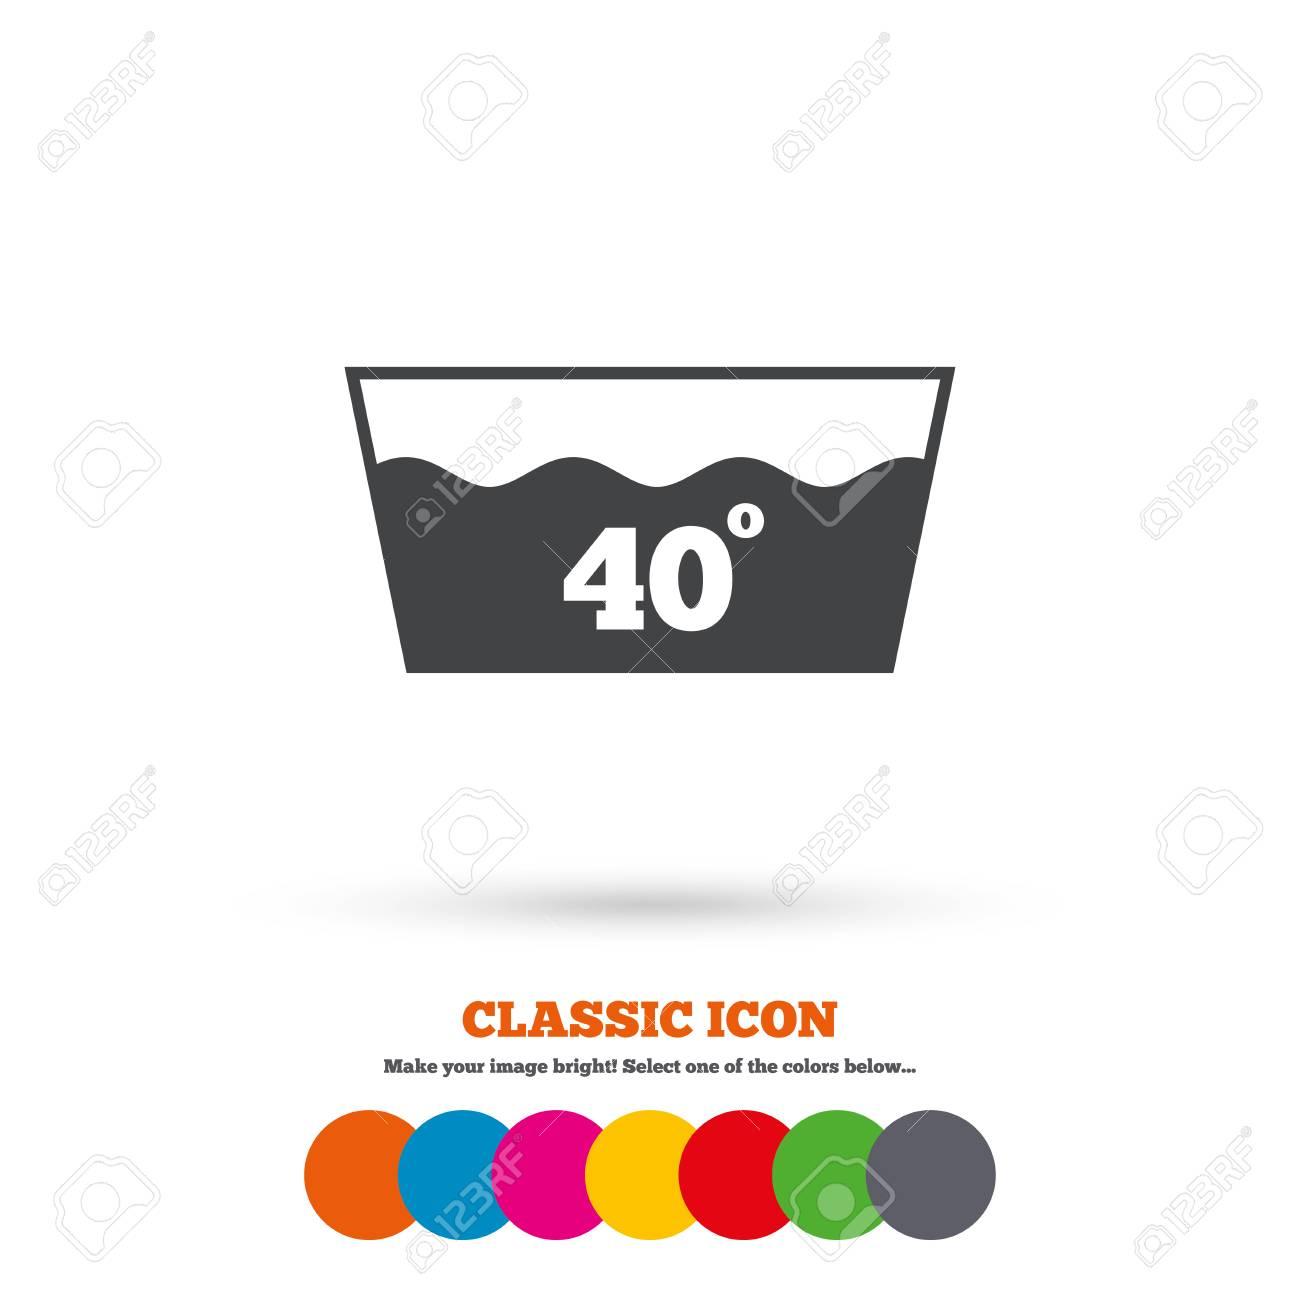 Wash Icon Machine Washable At 40 Degrees Symbol Classic Flat